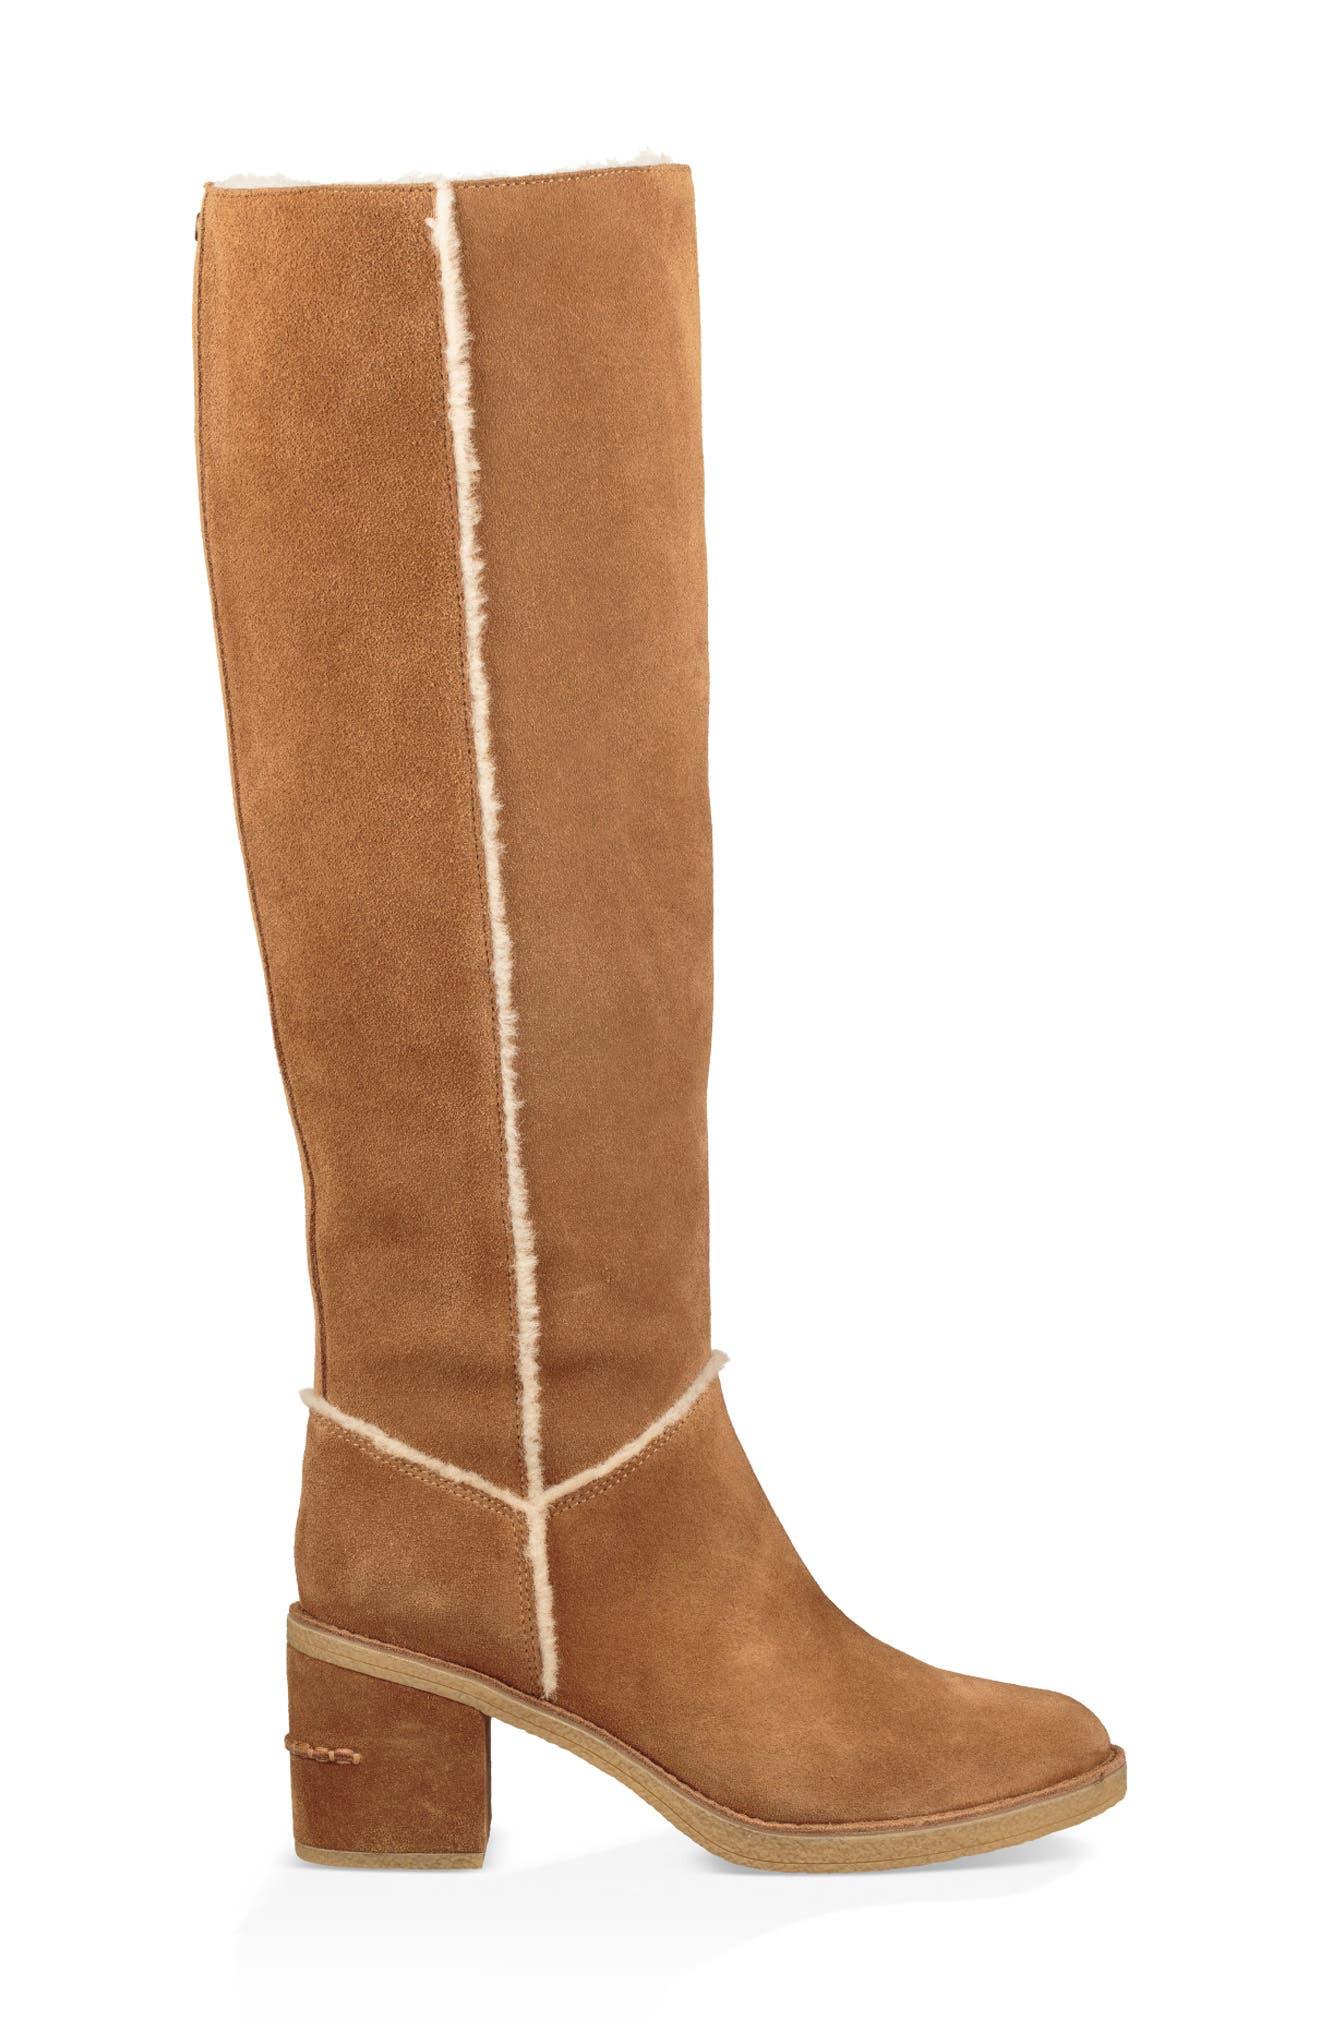 Kasen II Knee High Boot,                             Alternate thumbnail 3, color,                             CHESTNUT SUEDE